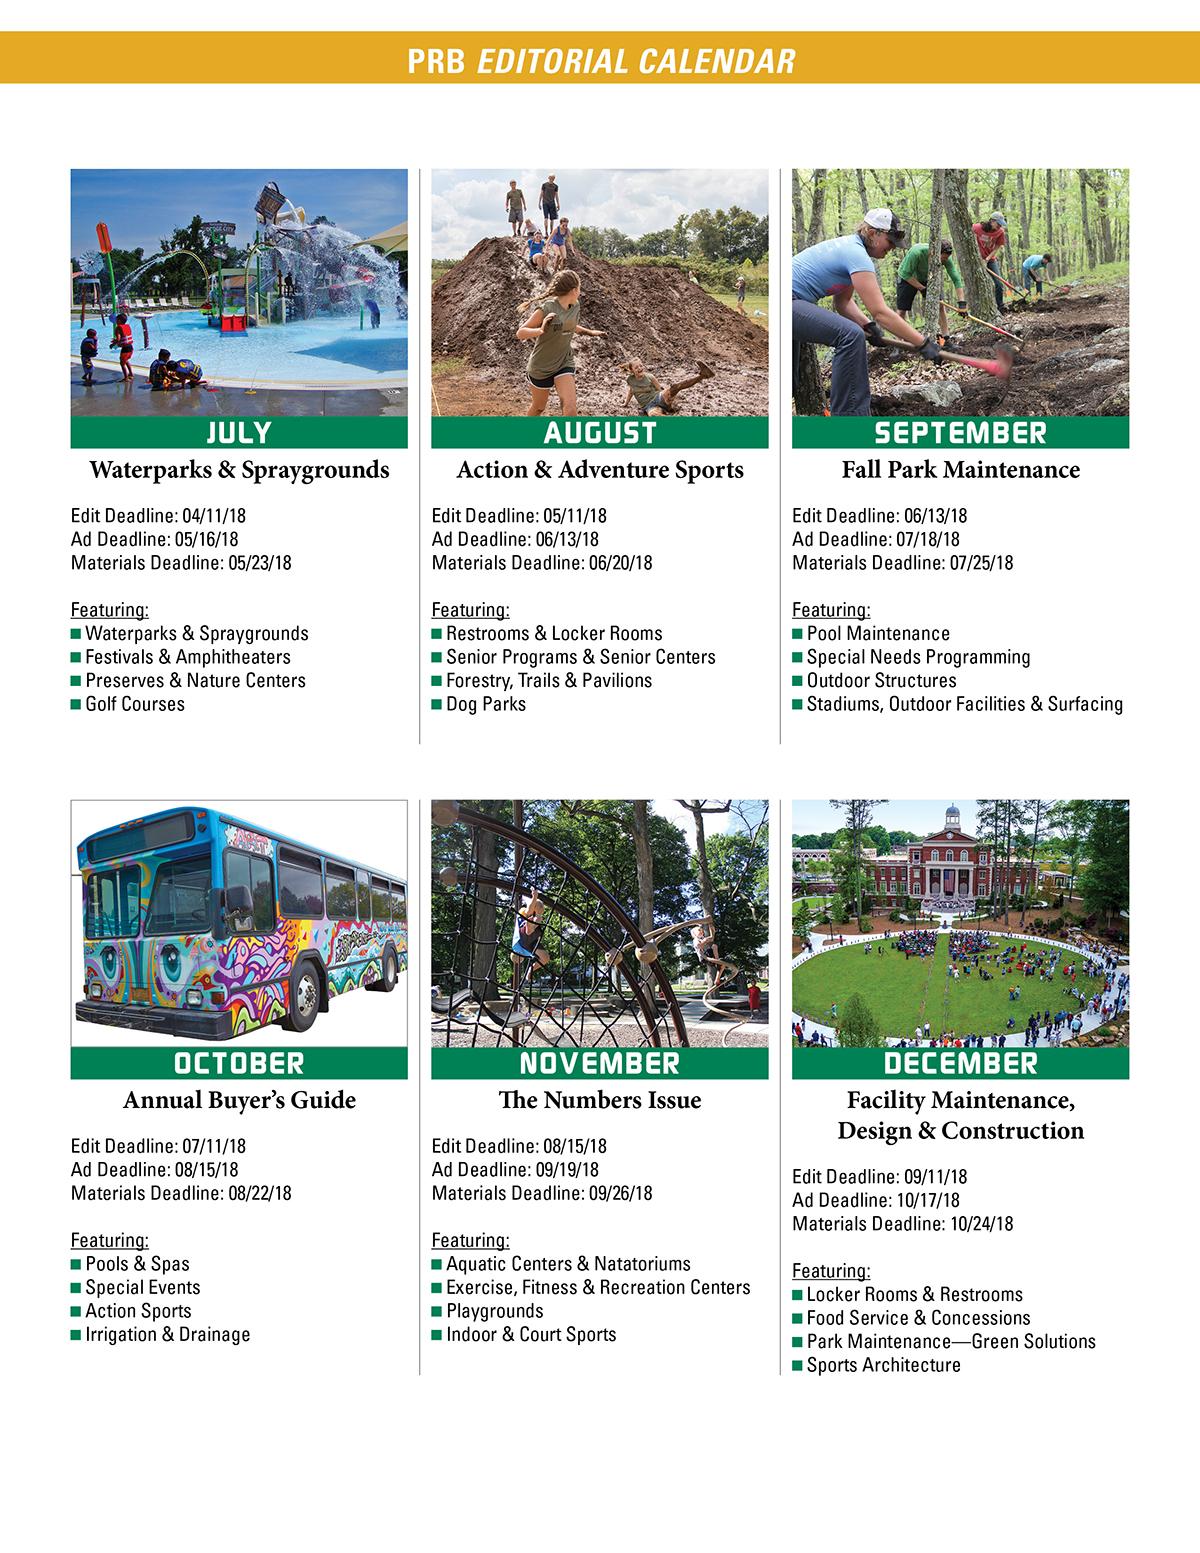 Editorial Calendar Page 2.jpg